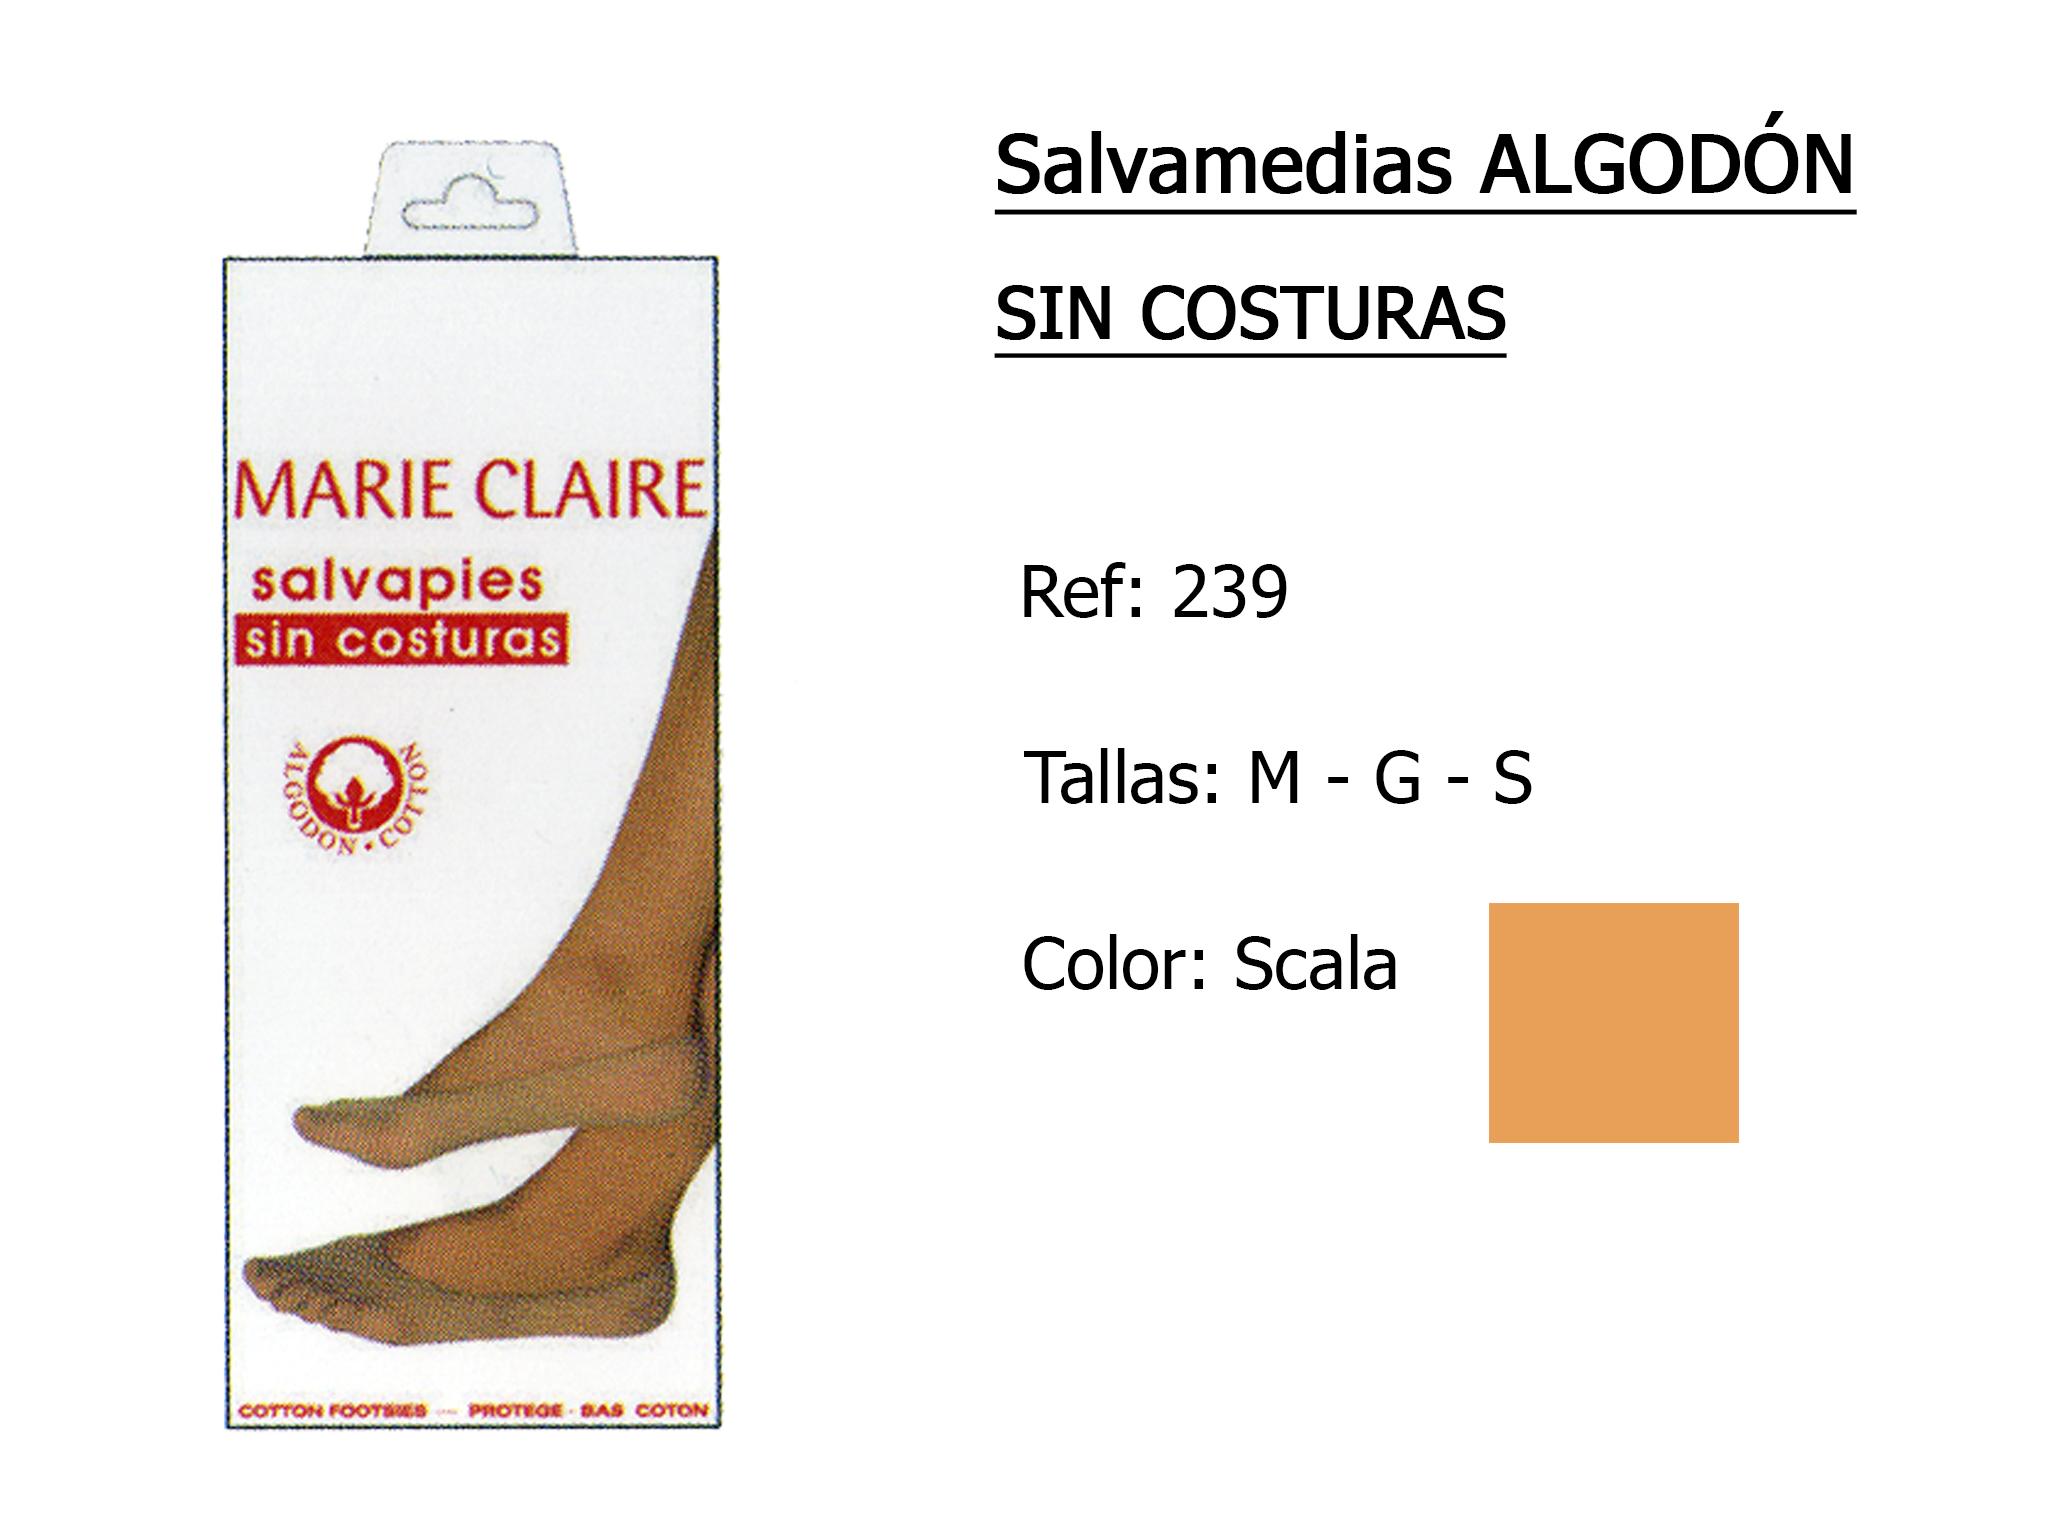 SALVAMEDIAS algodon sin costuras 239